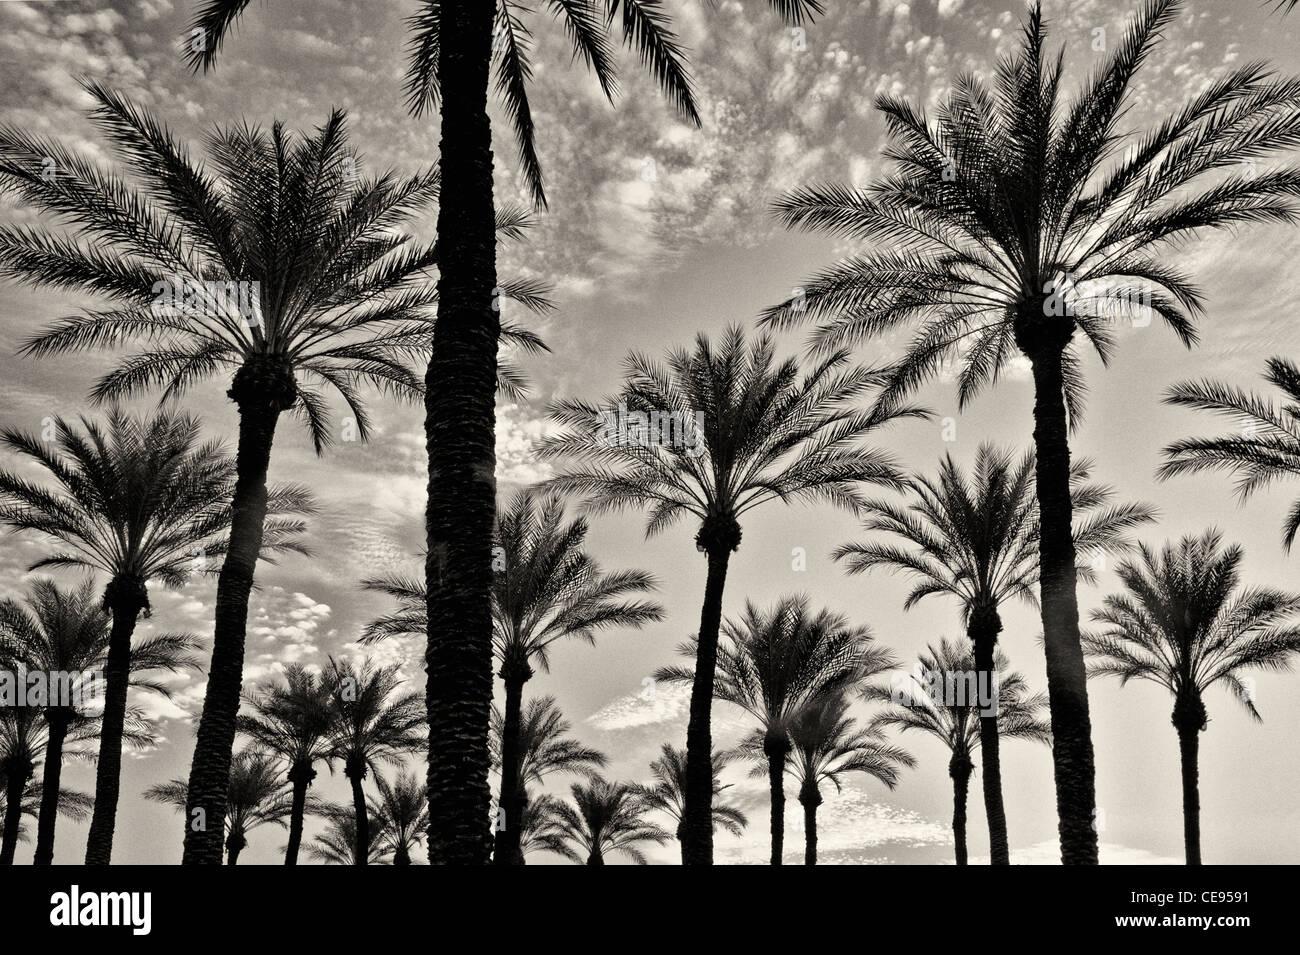 Palm trees at sunrise. Palm Desert, California - Stock Image